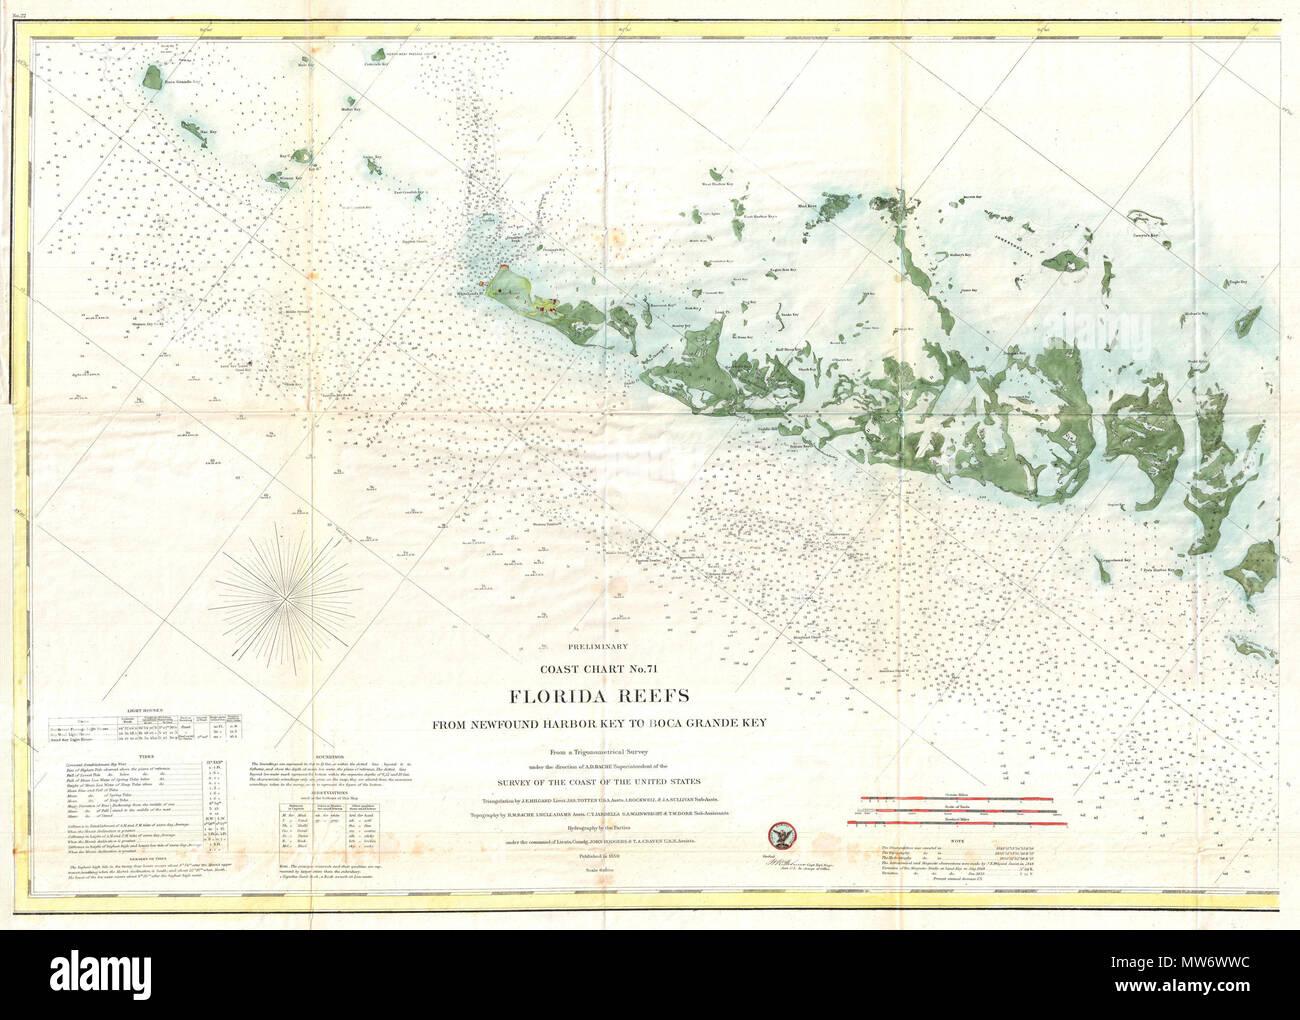 U S Coast Survey Triangulation Map Of The Florida Keys Stock Photos